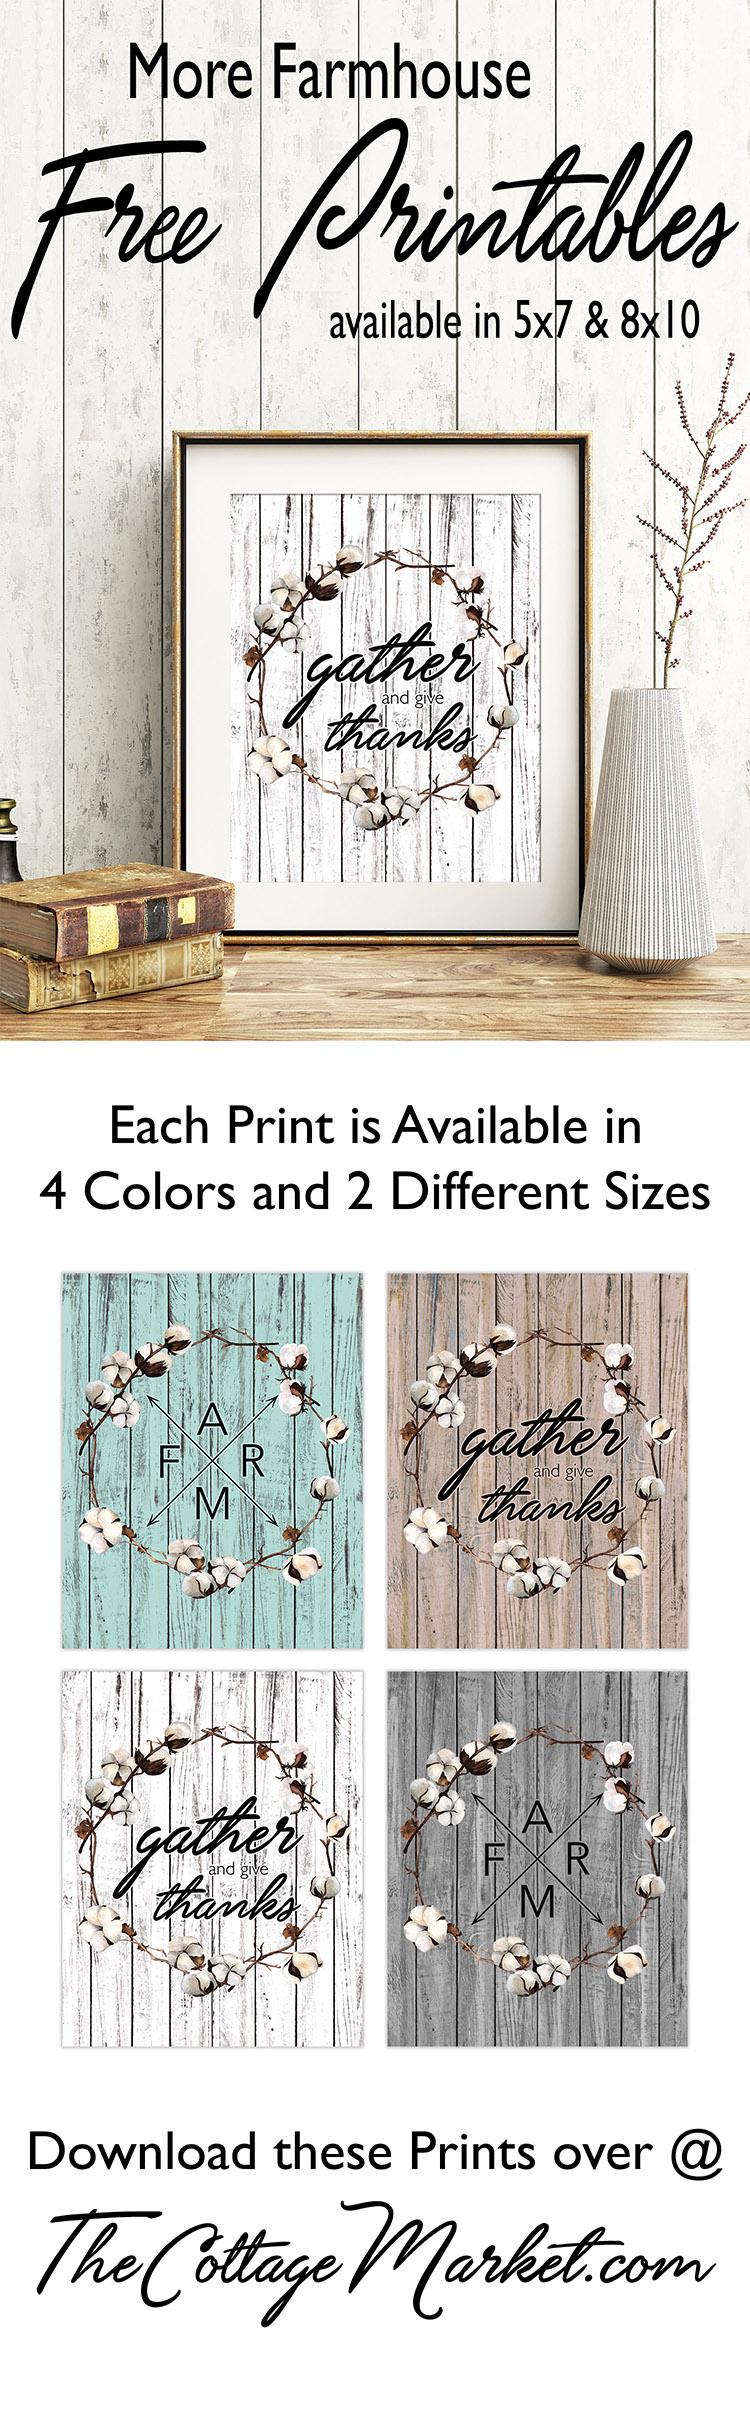 Free Home Decor Prints